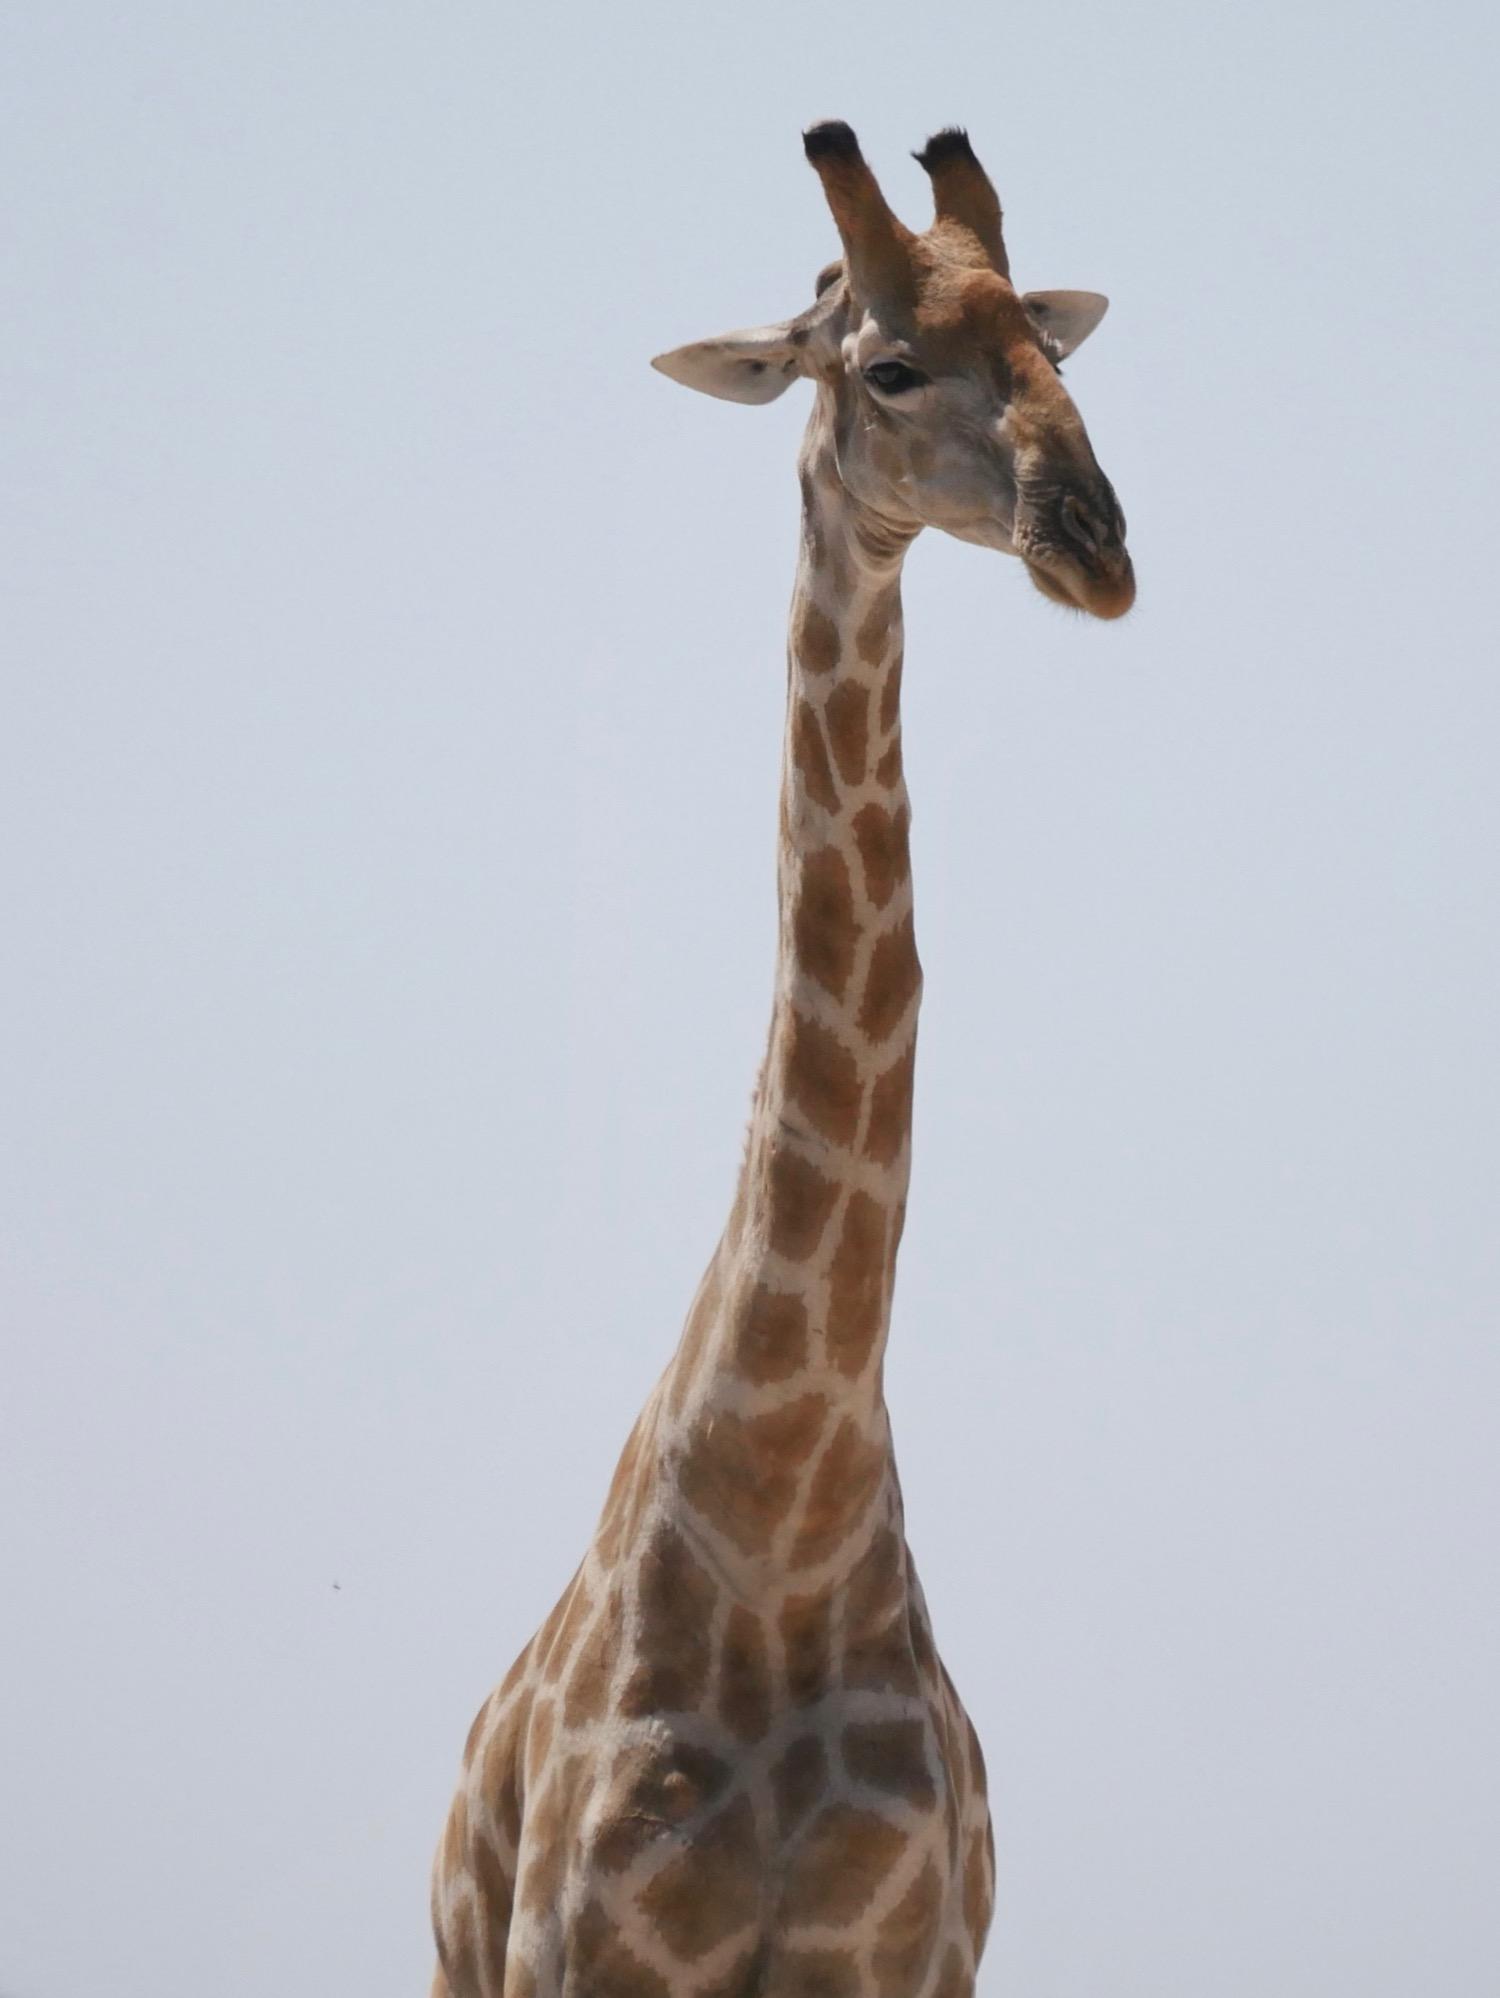 Une girafe à Etosha